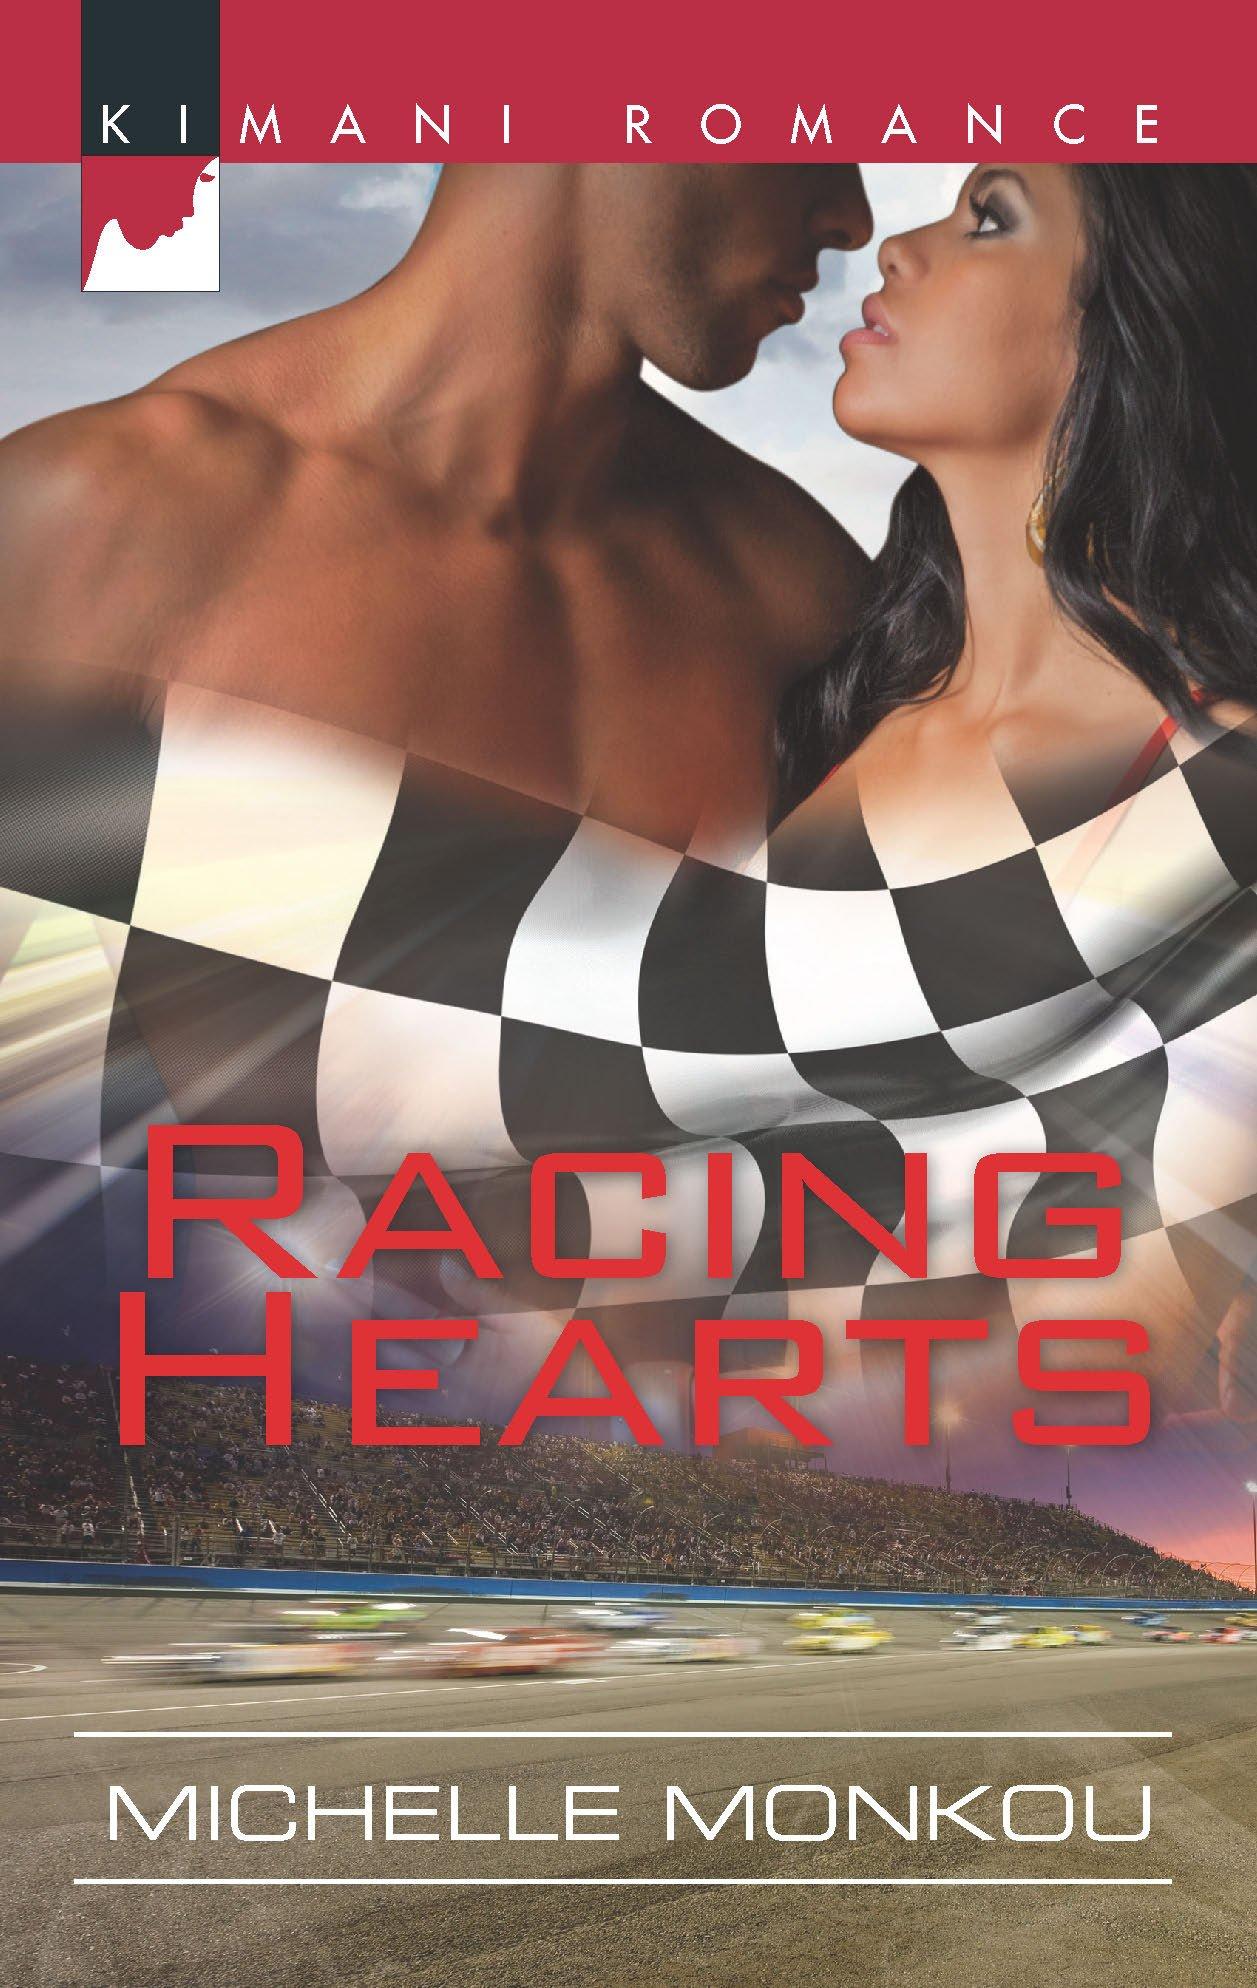 Amazon.com: Racing Hearts (Kimani Romance) (9780373862870): Michelle  Monkou: Books